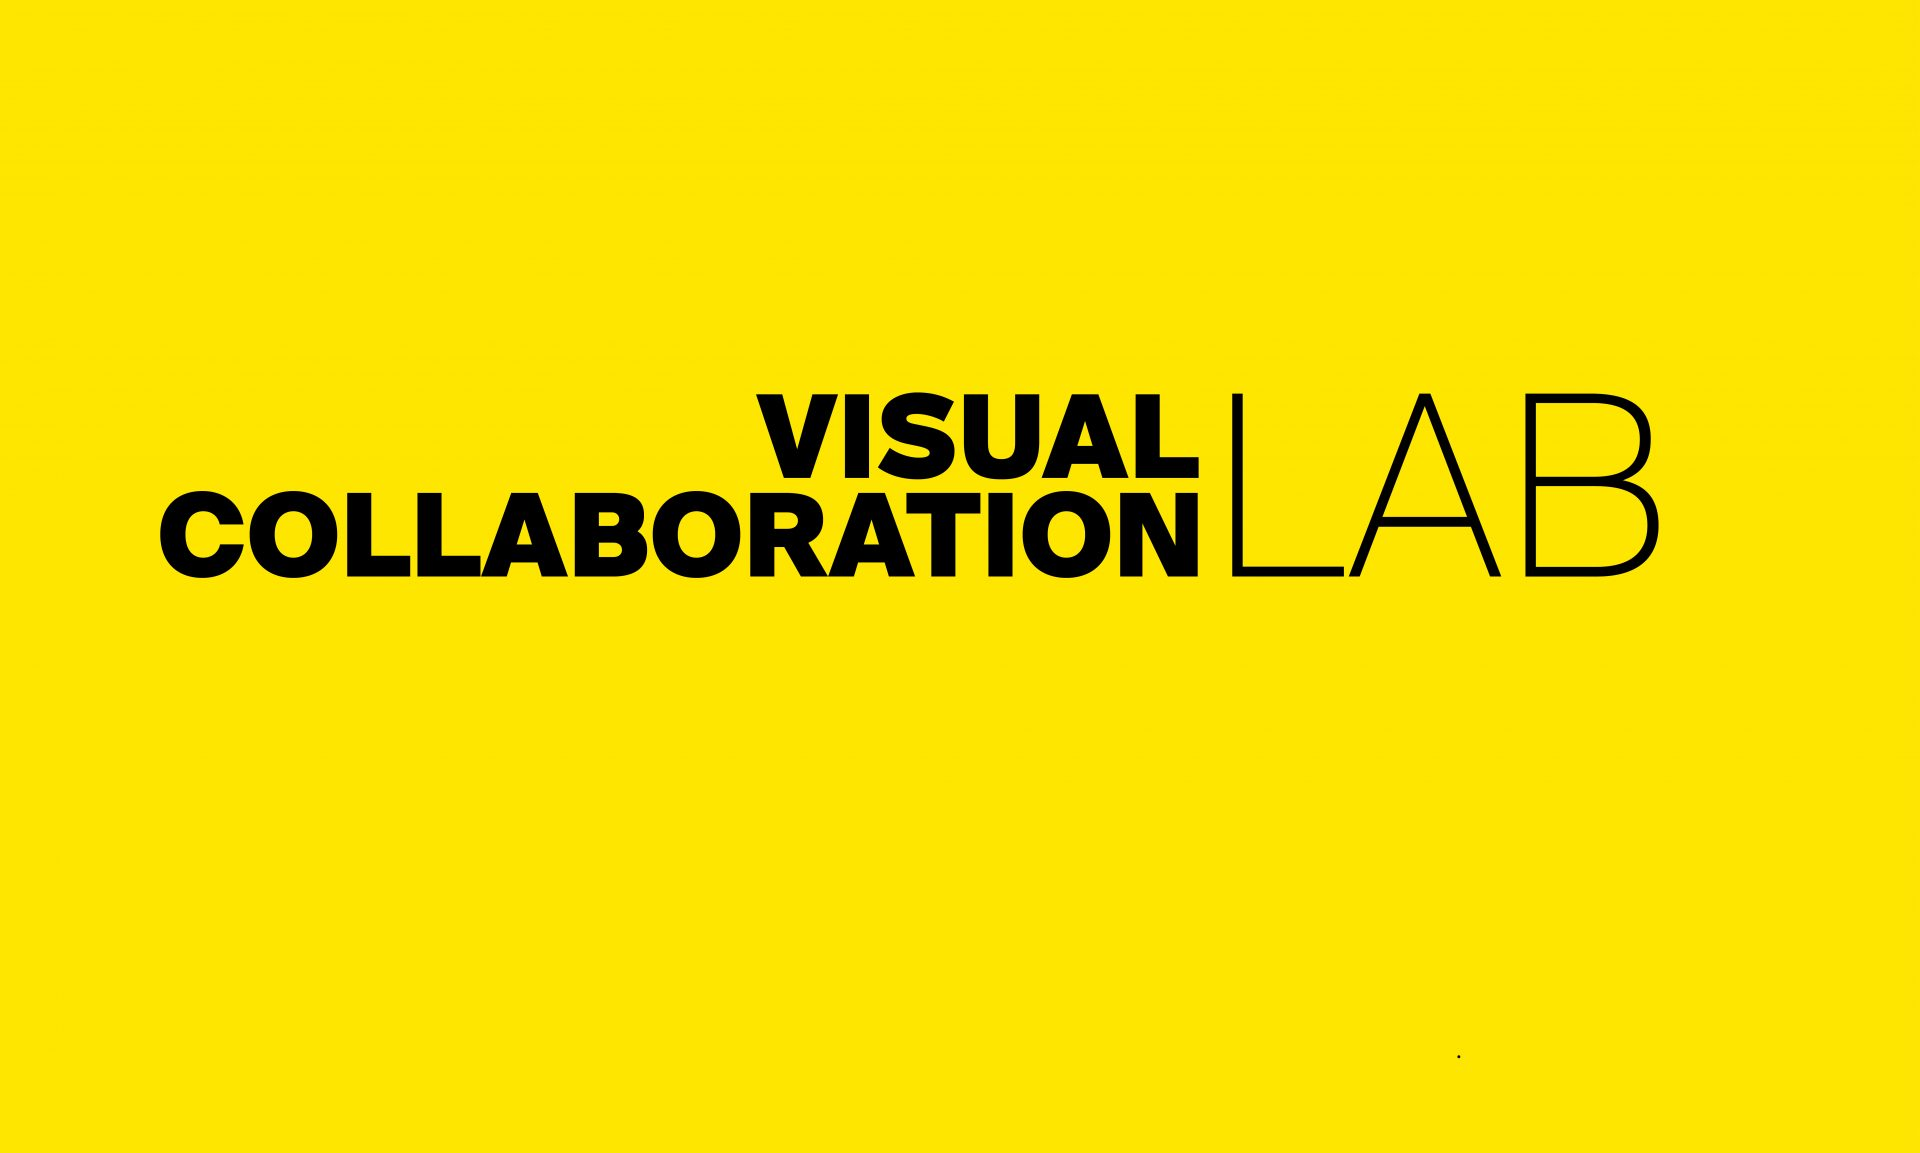 Visual collaboration lab